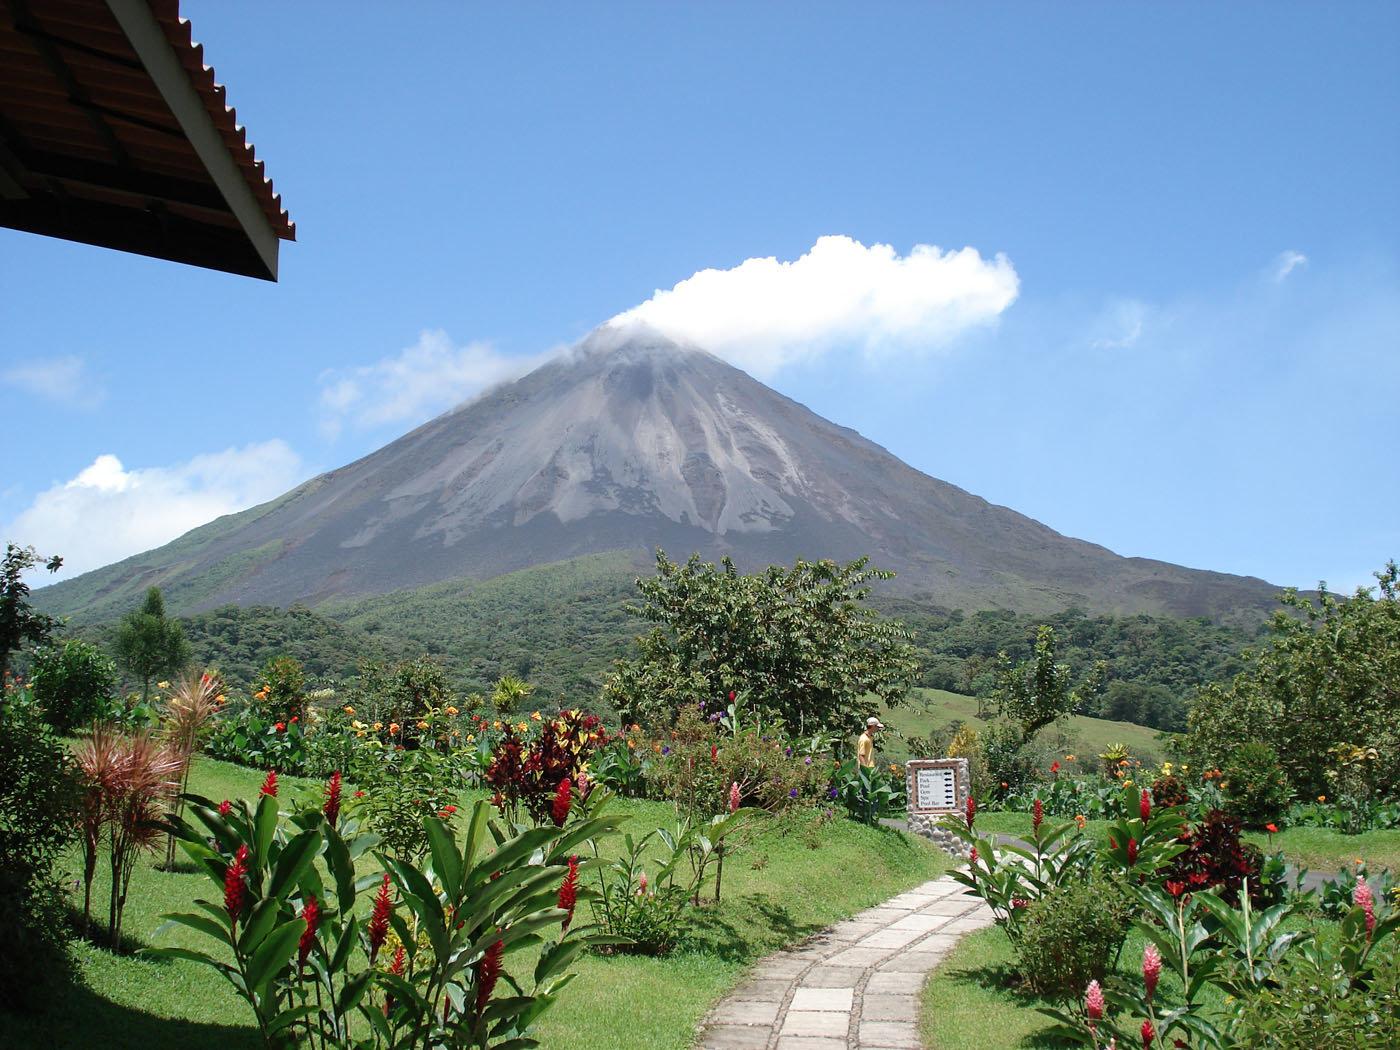 På en rejse til Costa Rica ser du vulkanen Arenal